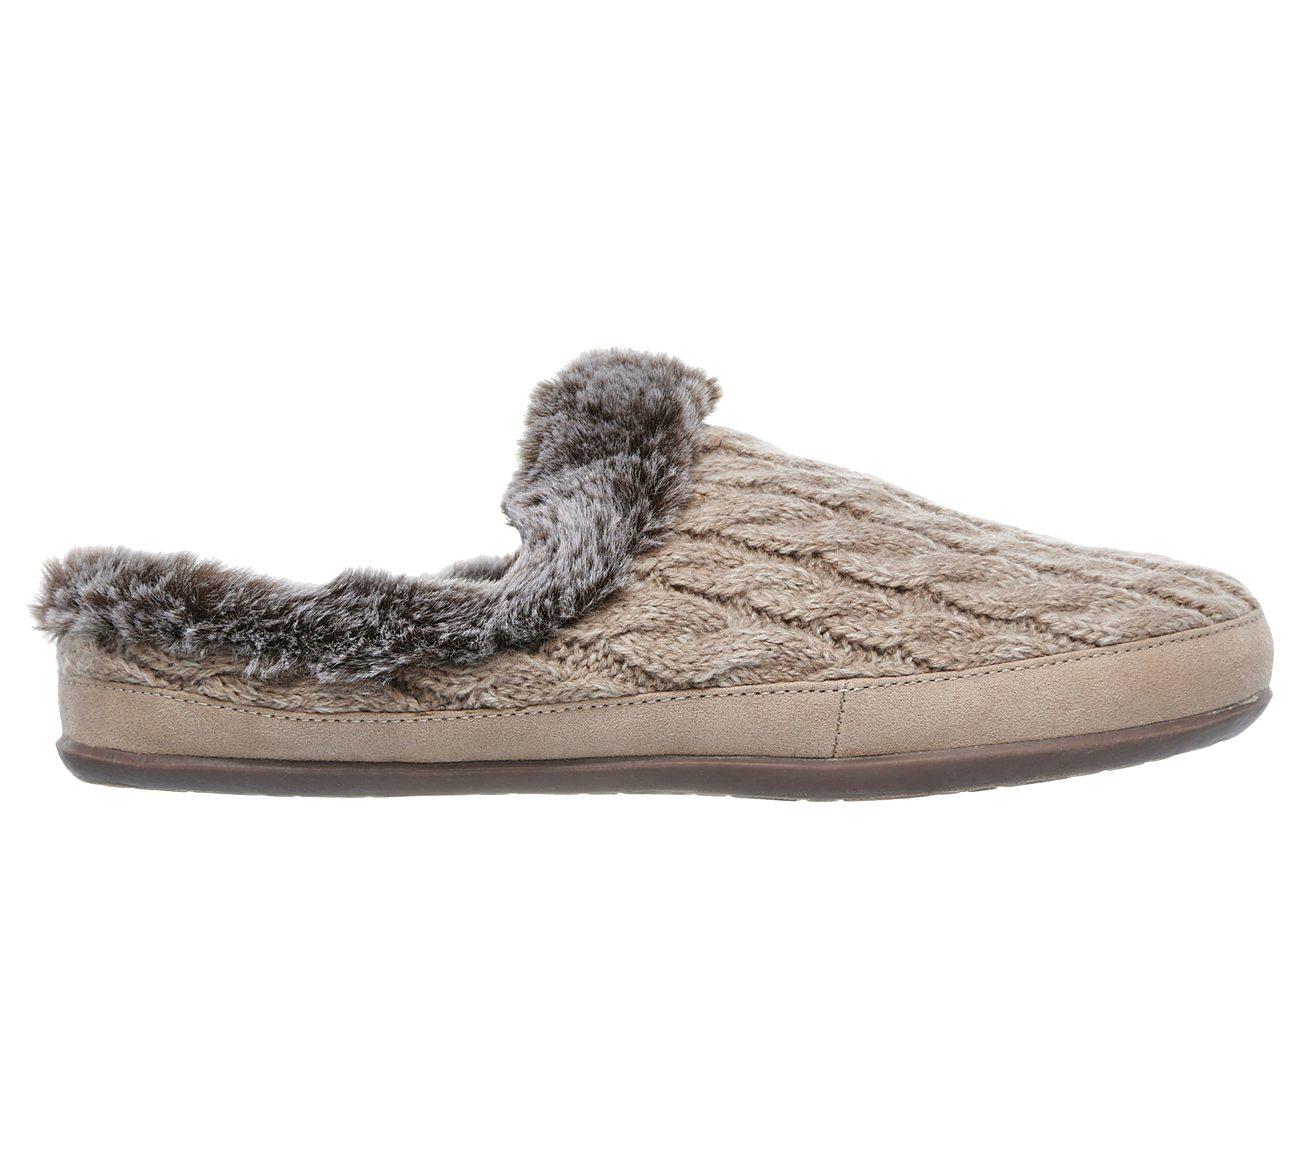 63141424b89a Buy SKECHERS Beach Bonfire Cali Shoes only  42.00